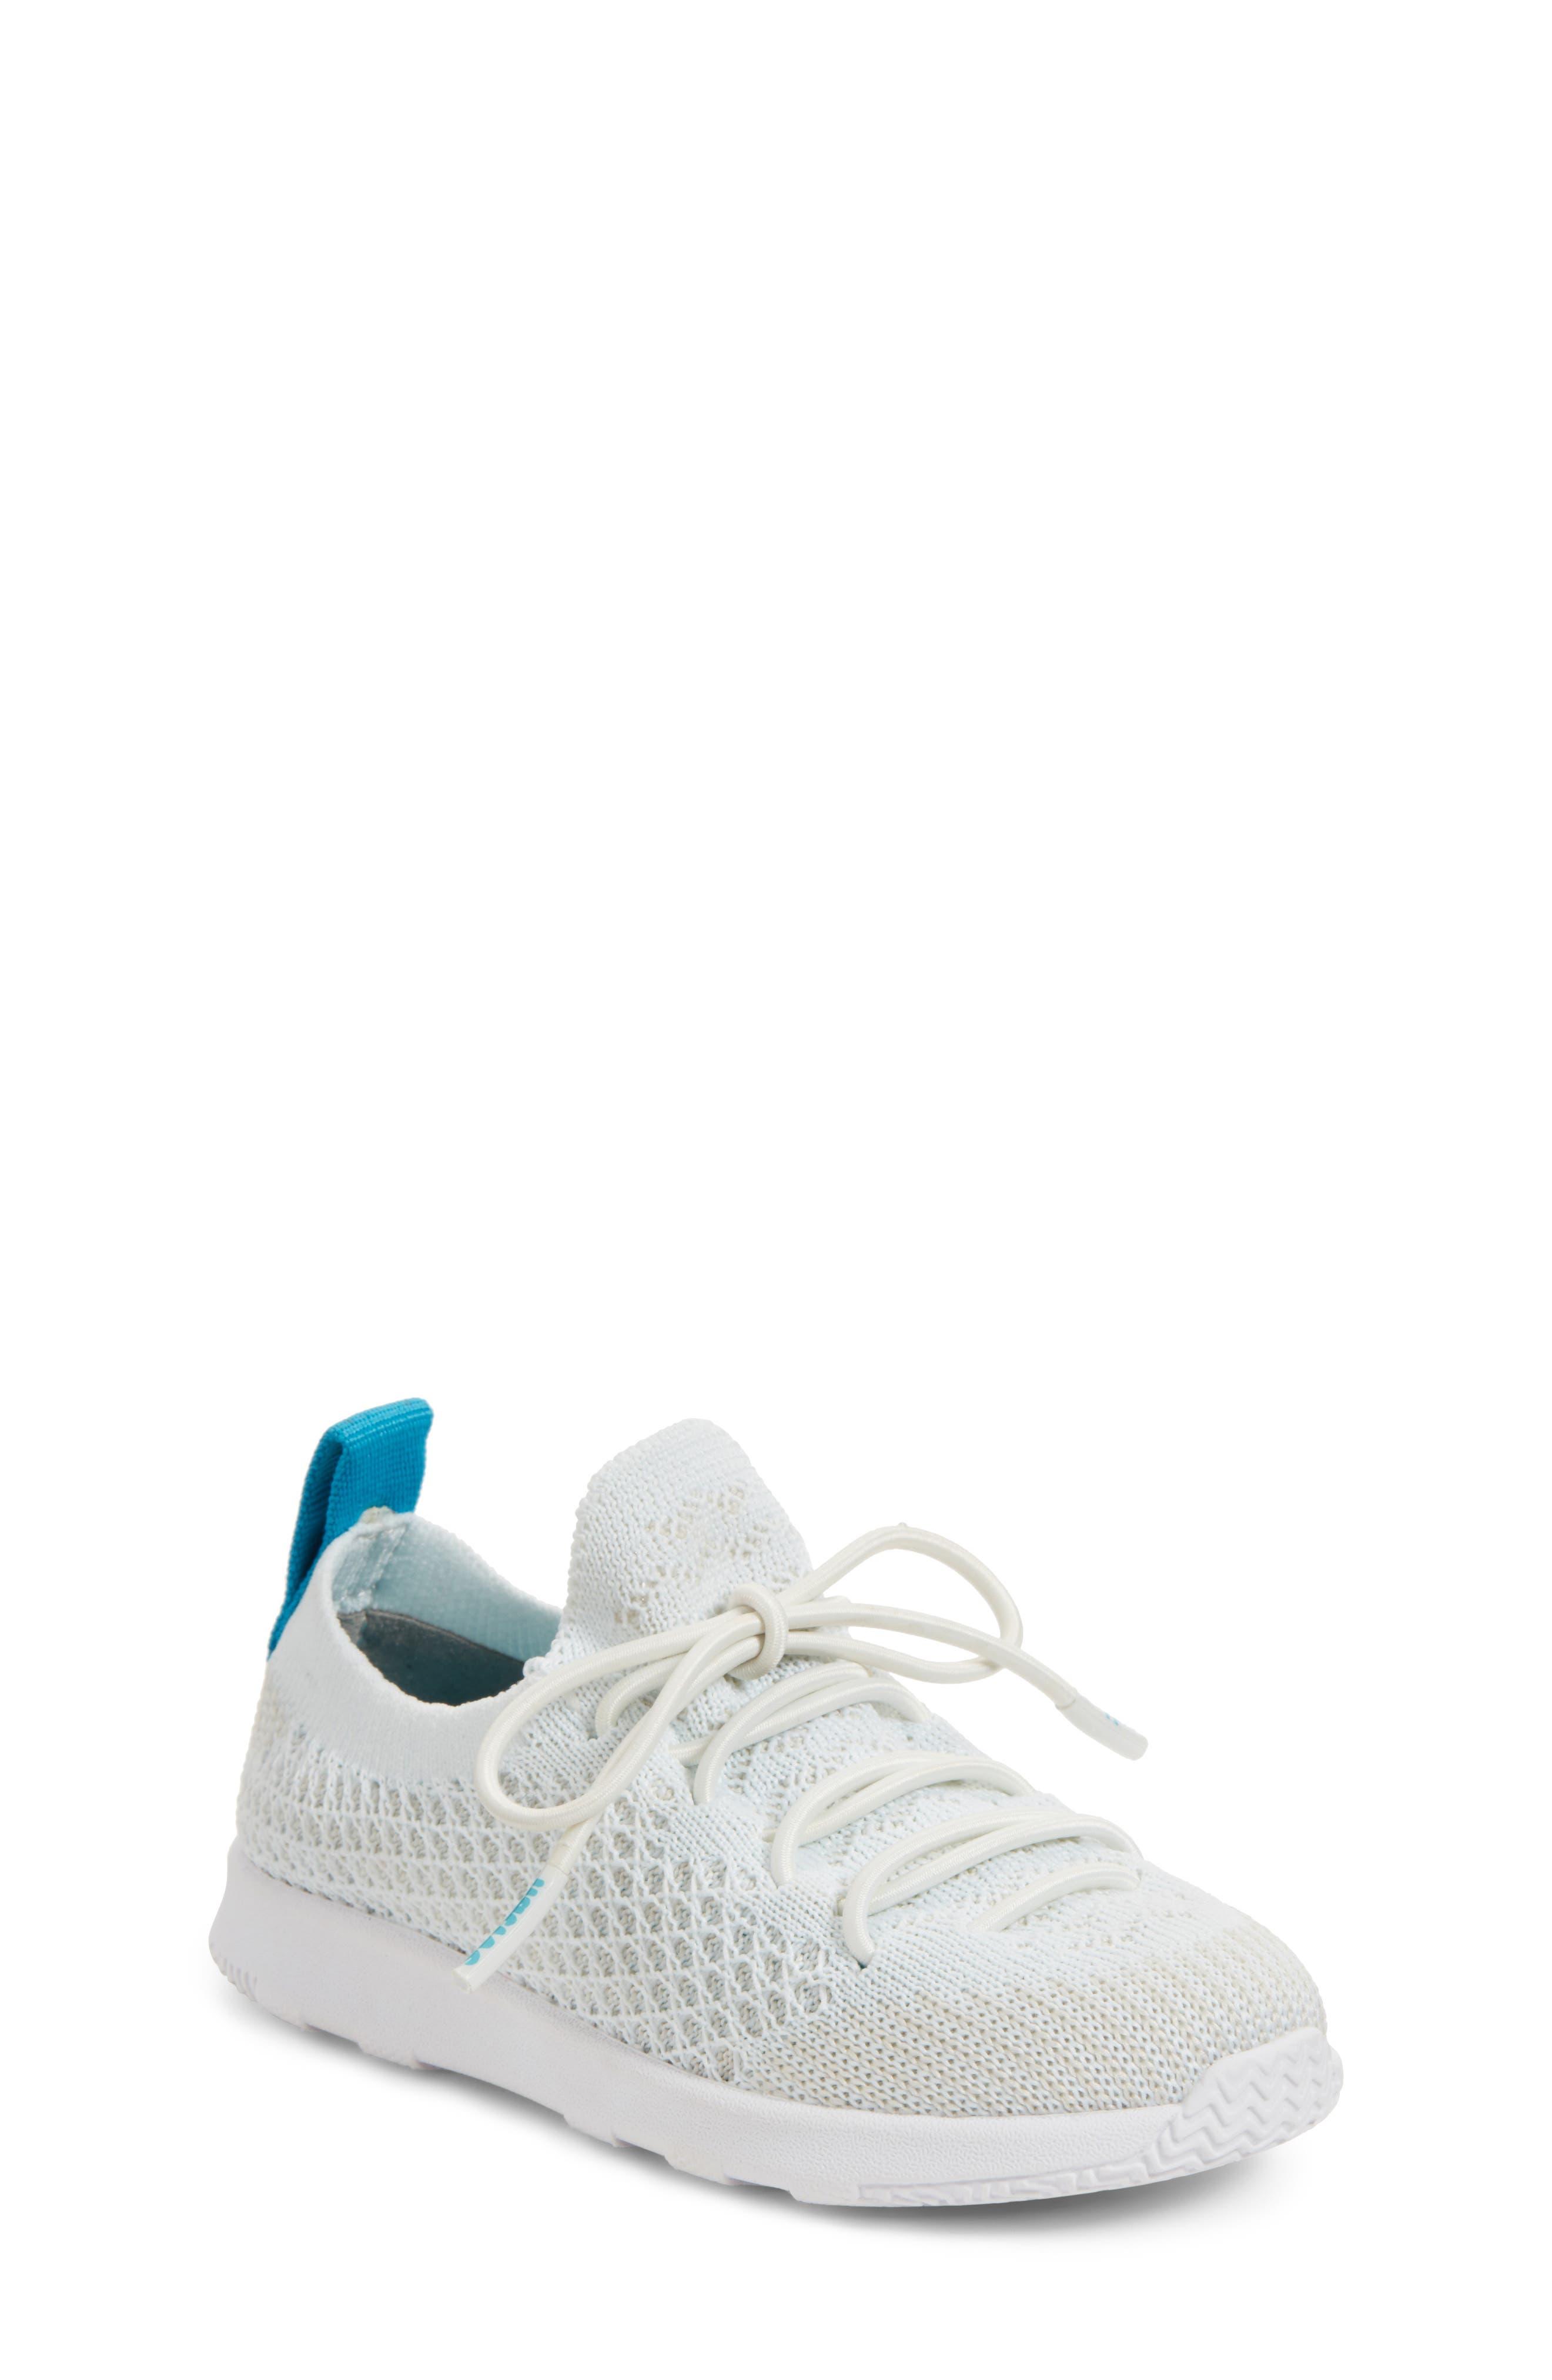 Native Shoes AP Mercury LiteKnit Sneaker (Walker, Toddler, Little Kid & Big Kid)